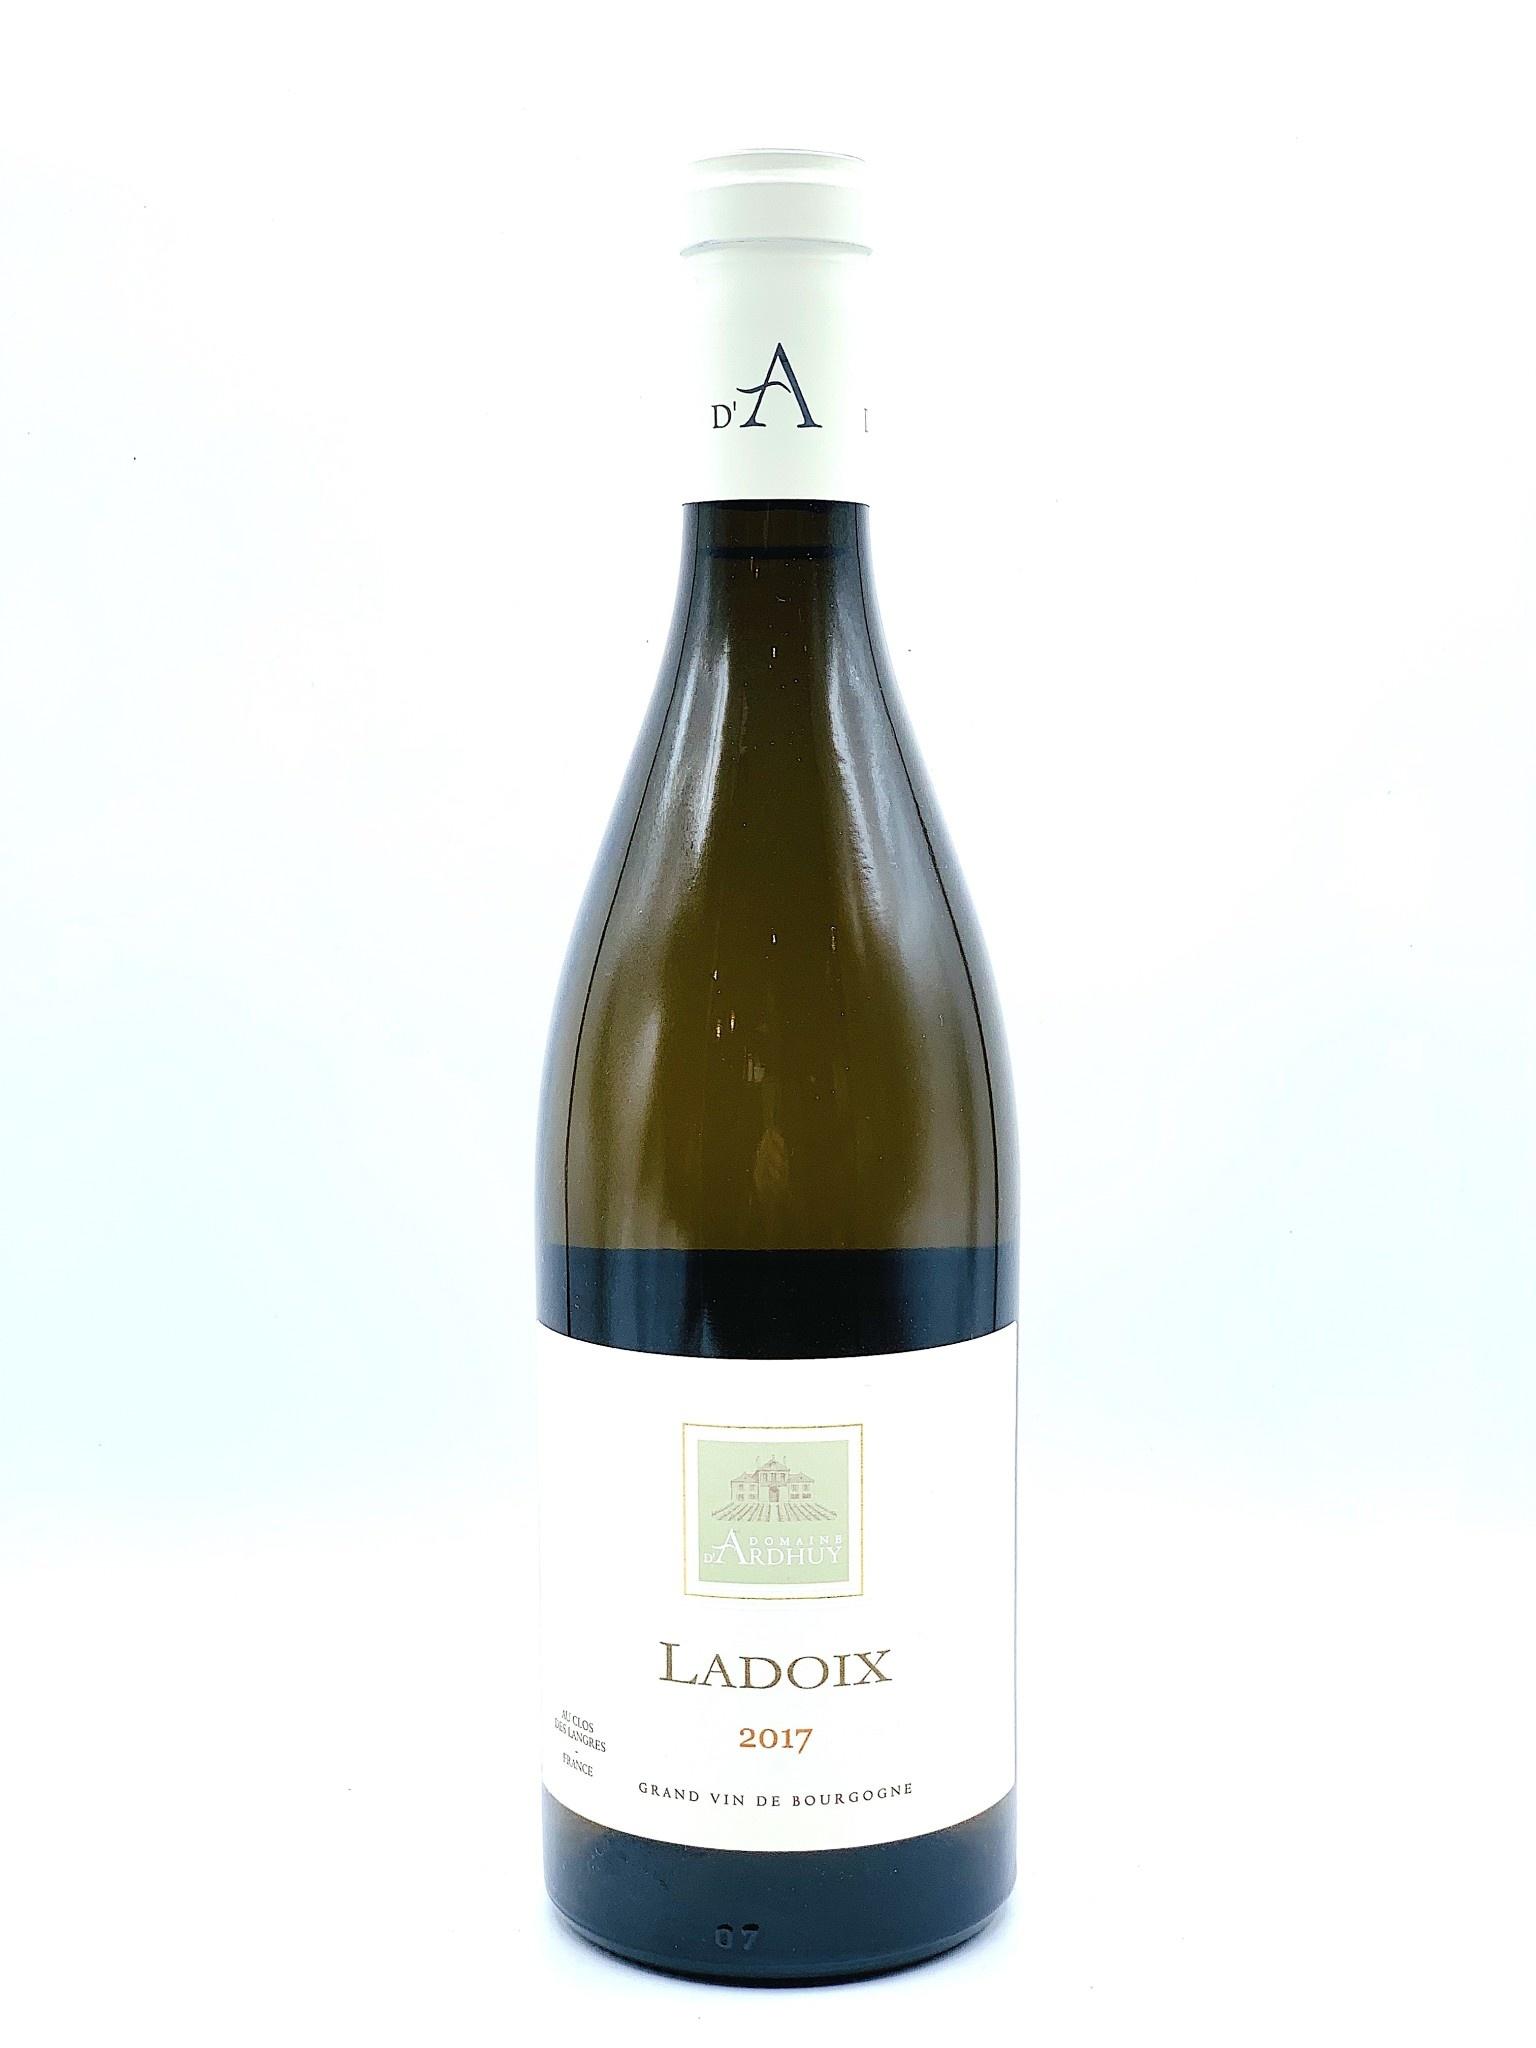 Bourgogne Blanc Ladoix 2017 Domaine d'Ardhuy